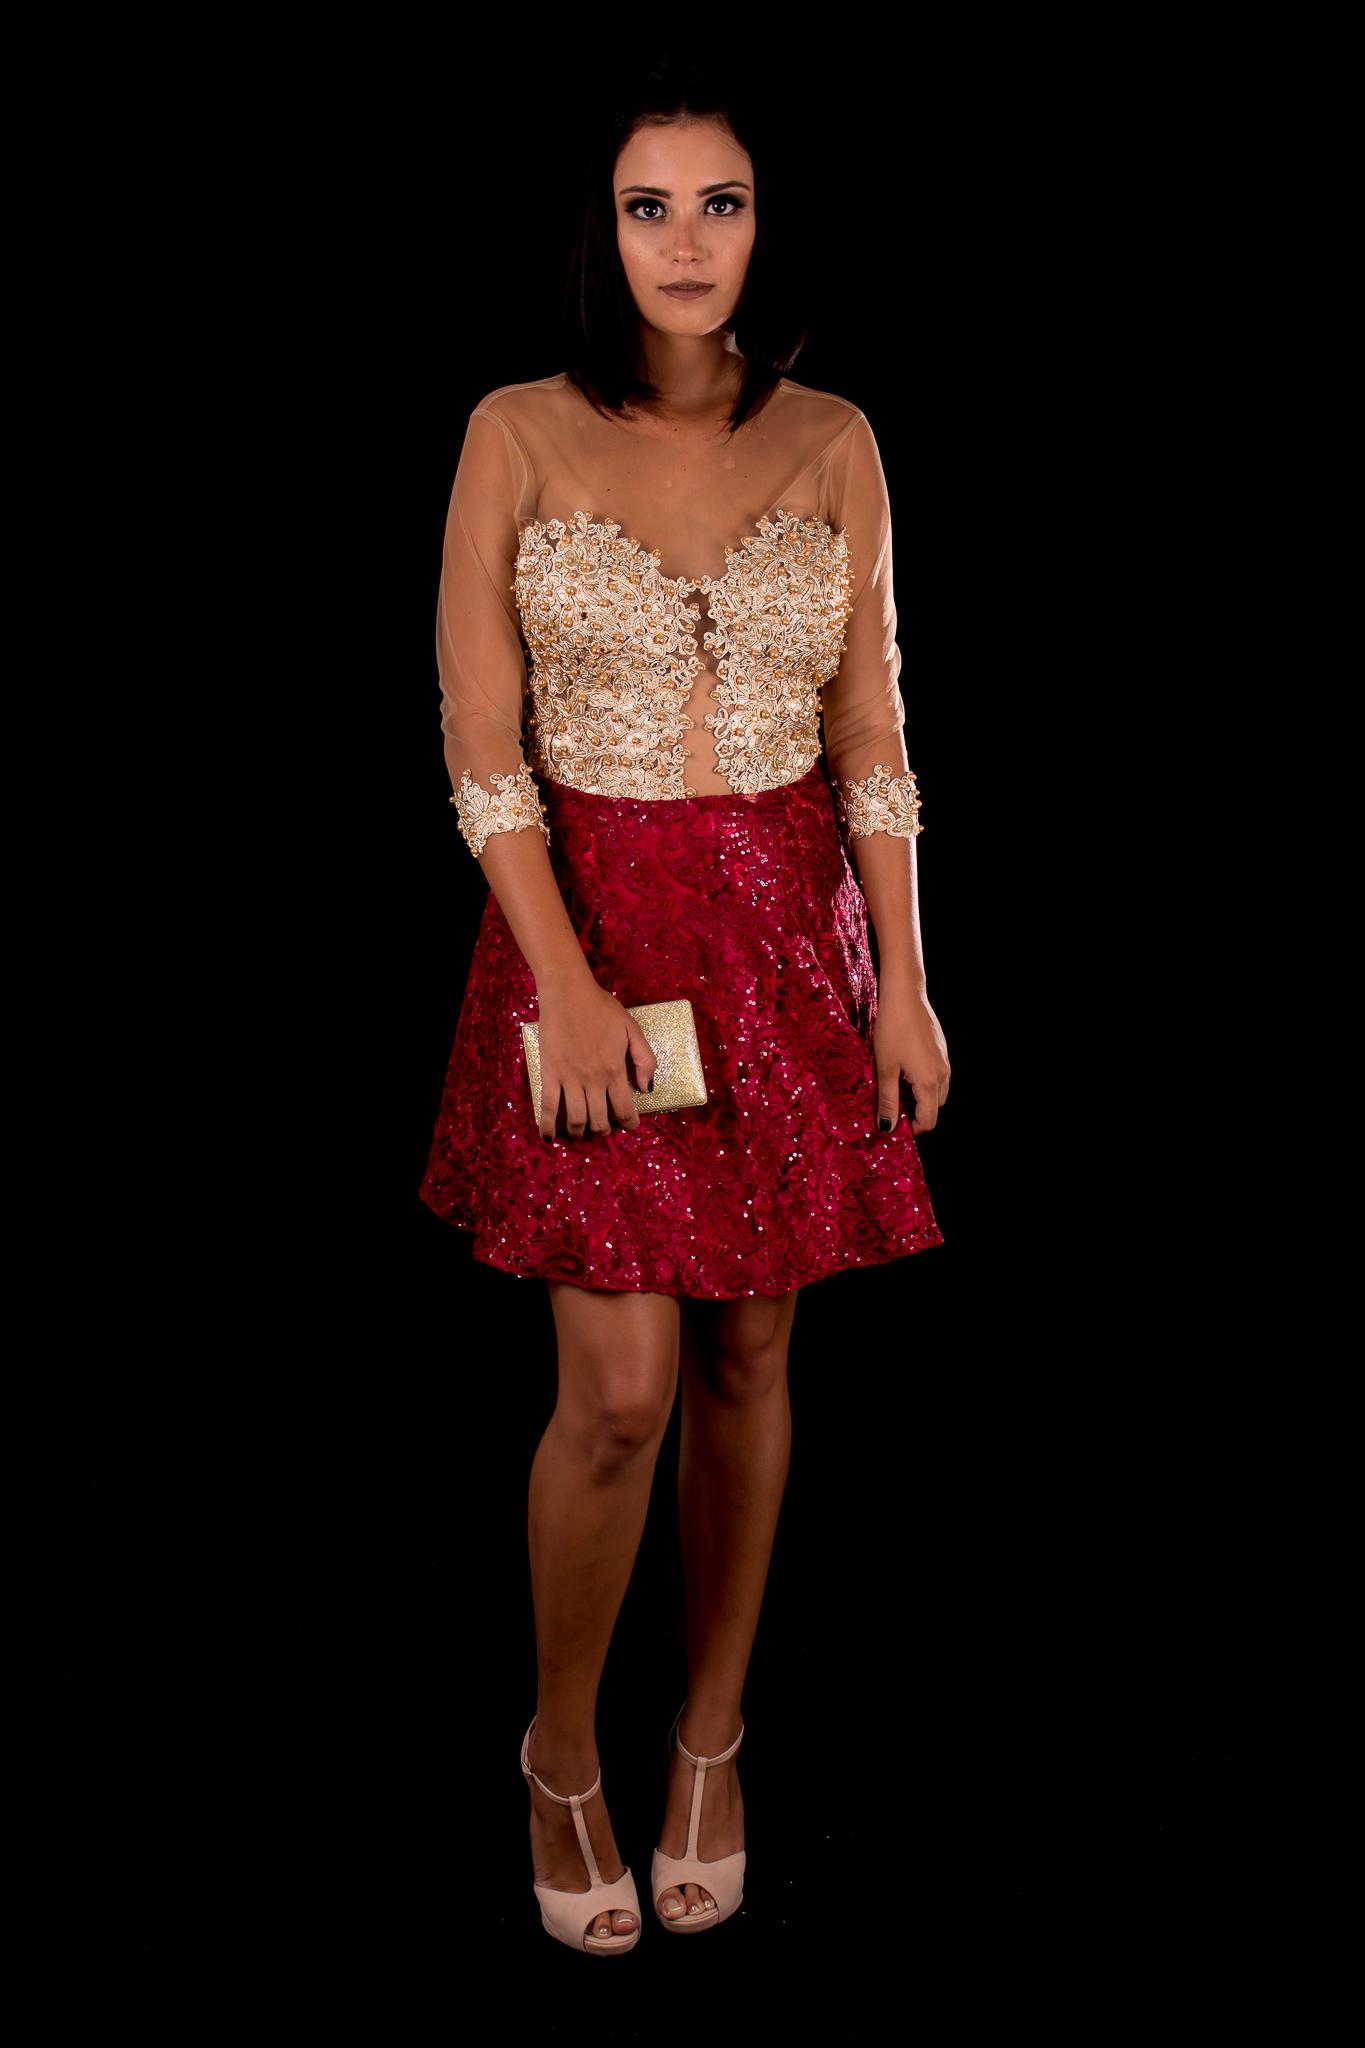 83c304c9a6 Vestido Curto Dourado com Marsala Mangas Longas Bordadas – Aluguel de  Vestidos de Festa RJ